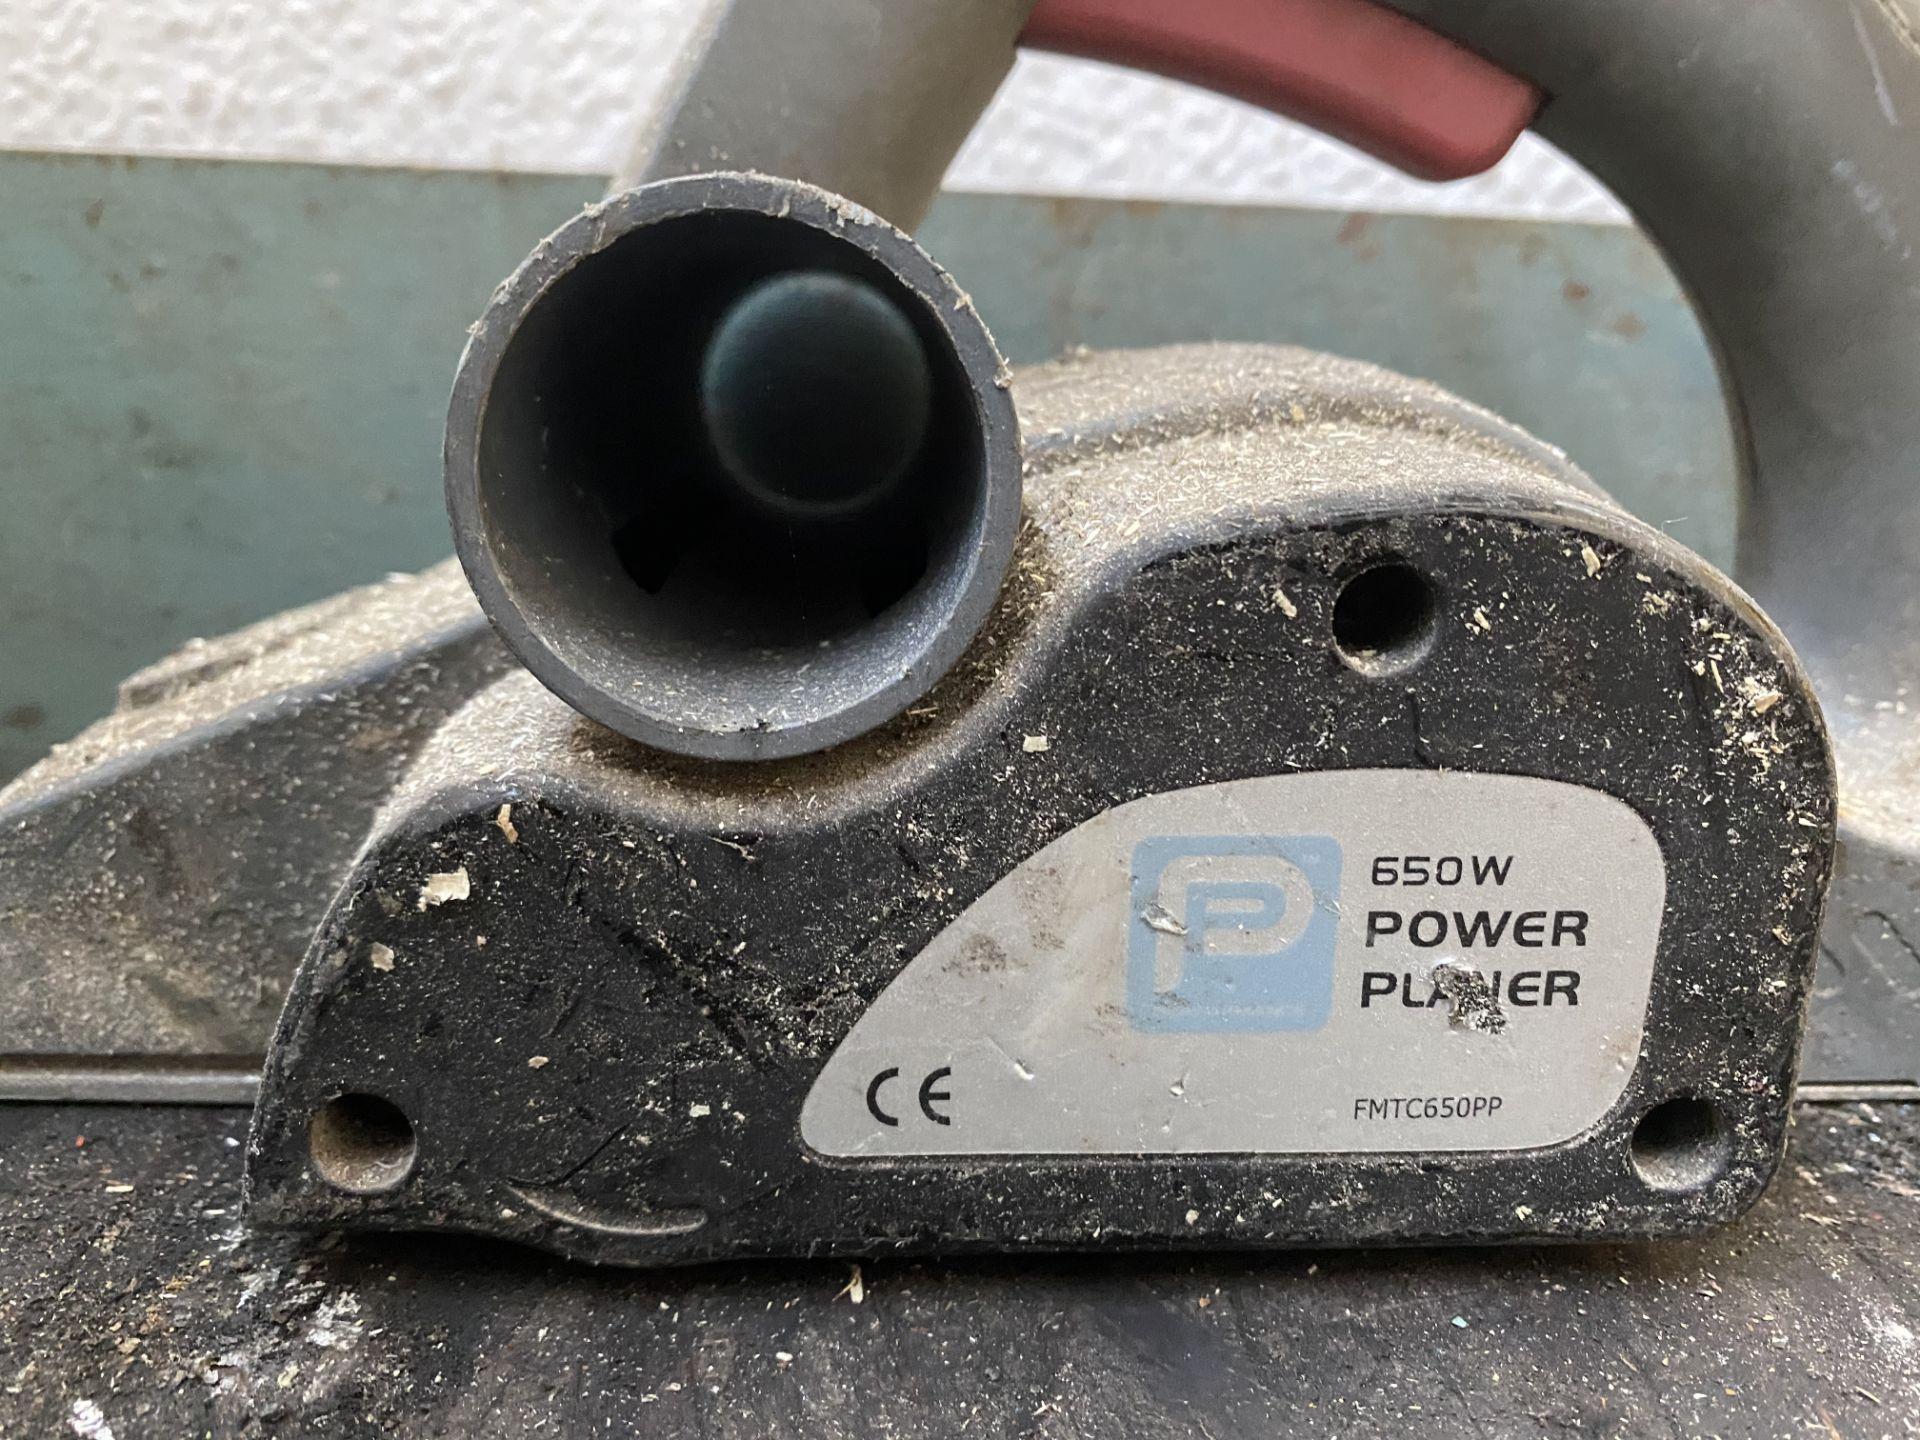 FMTC650PP Power Planer - Image 5 of 6